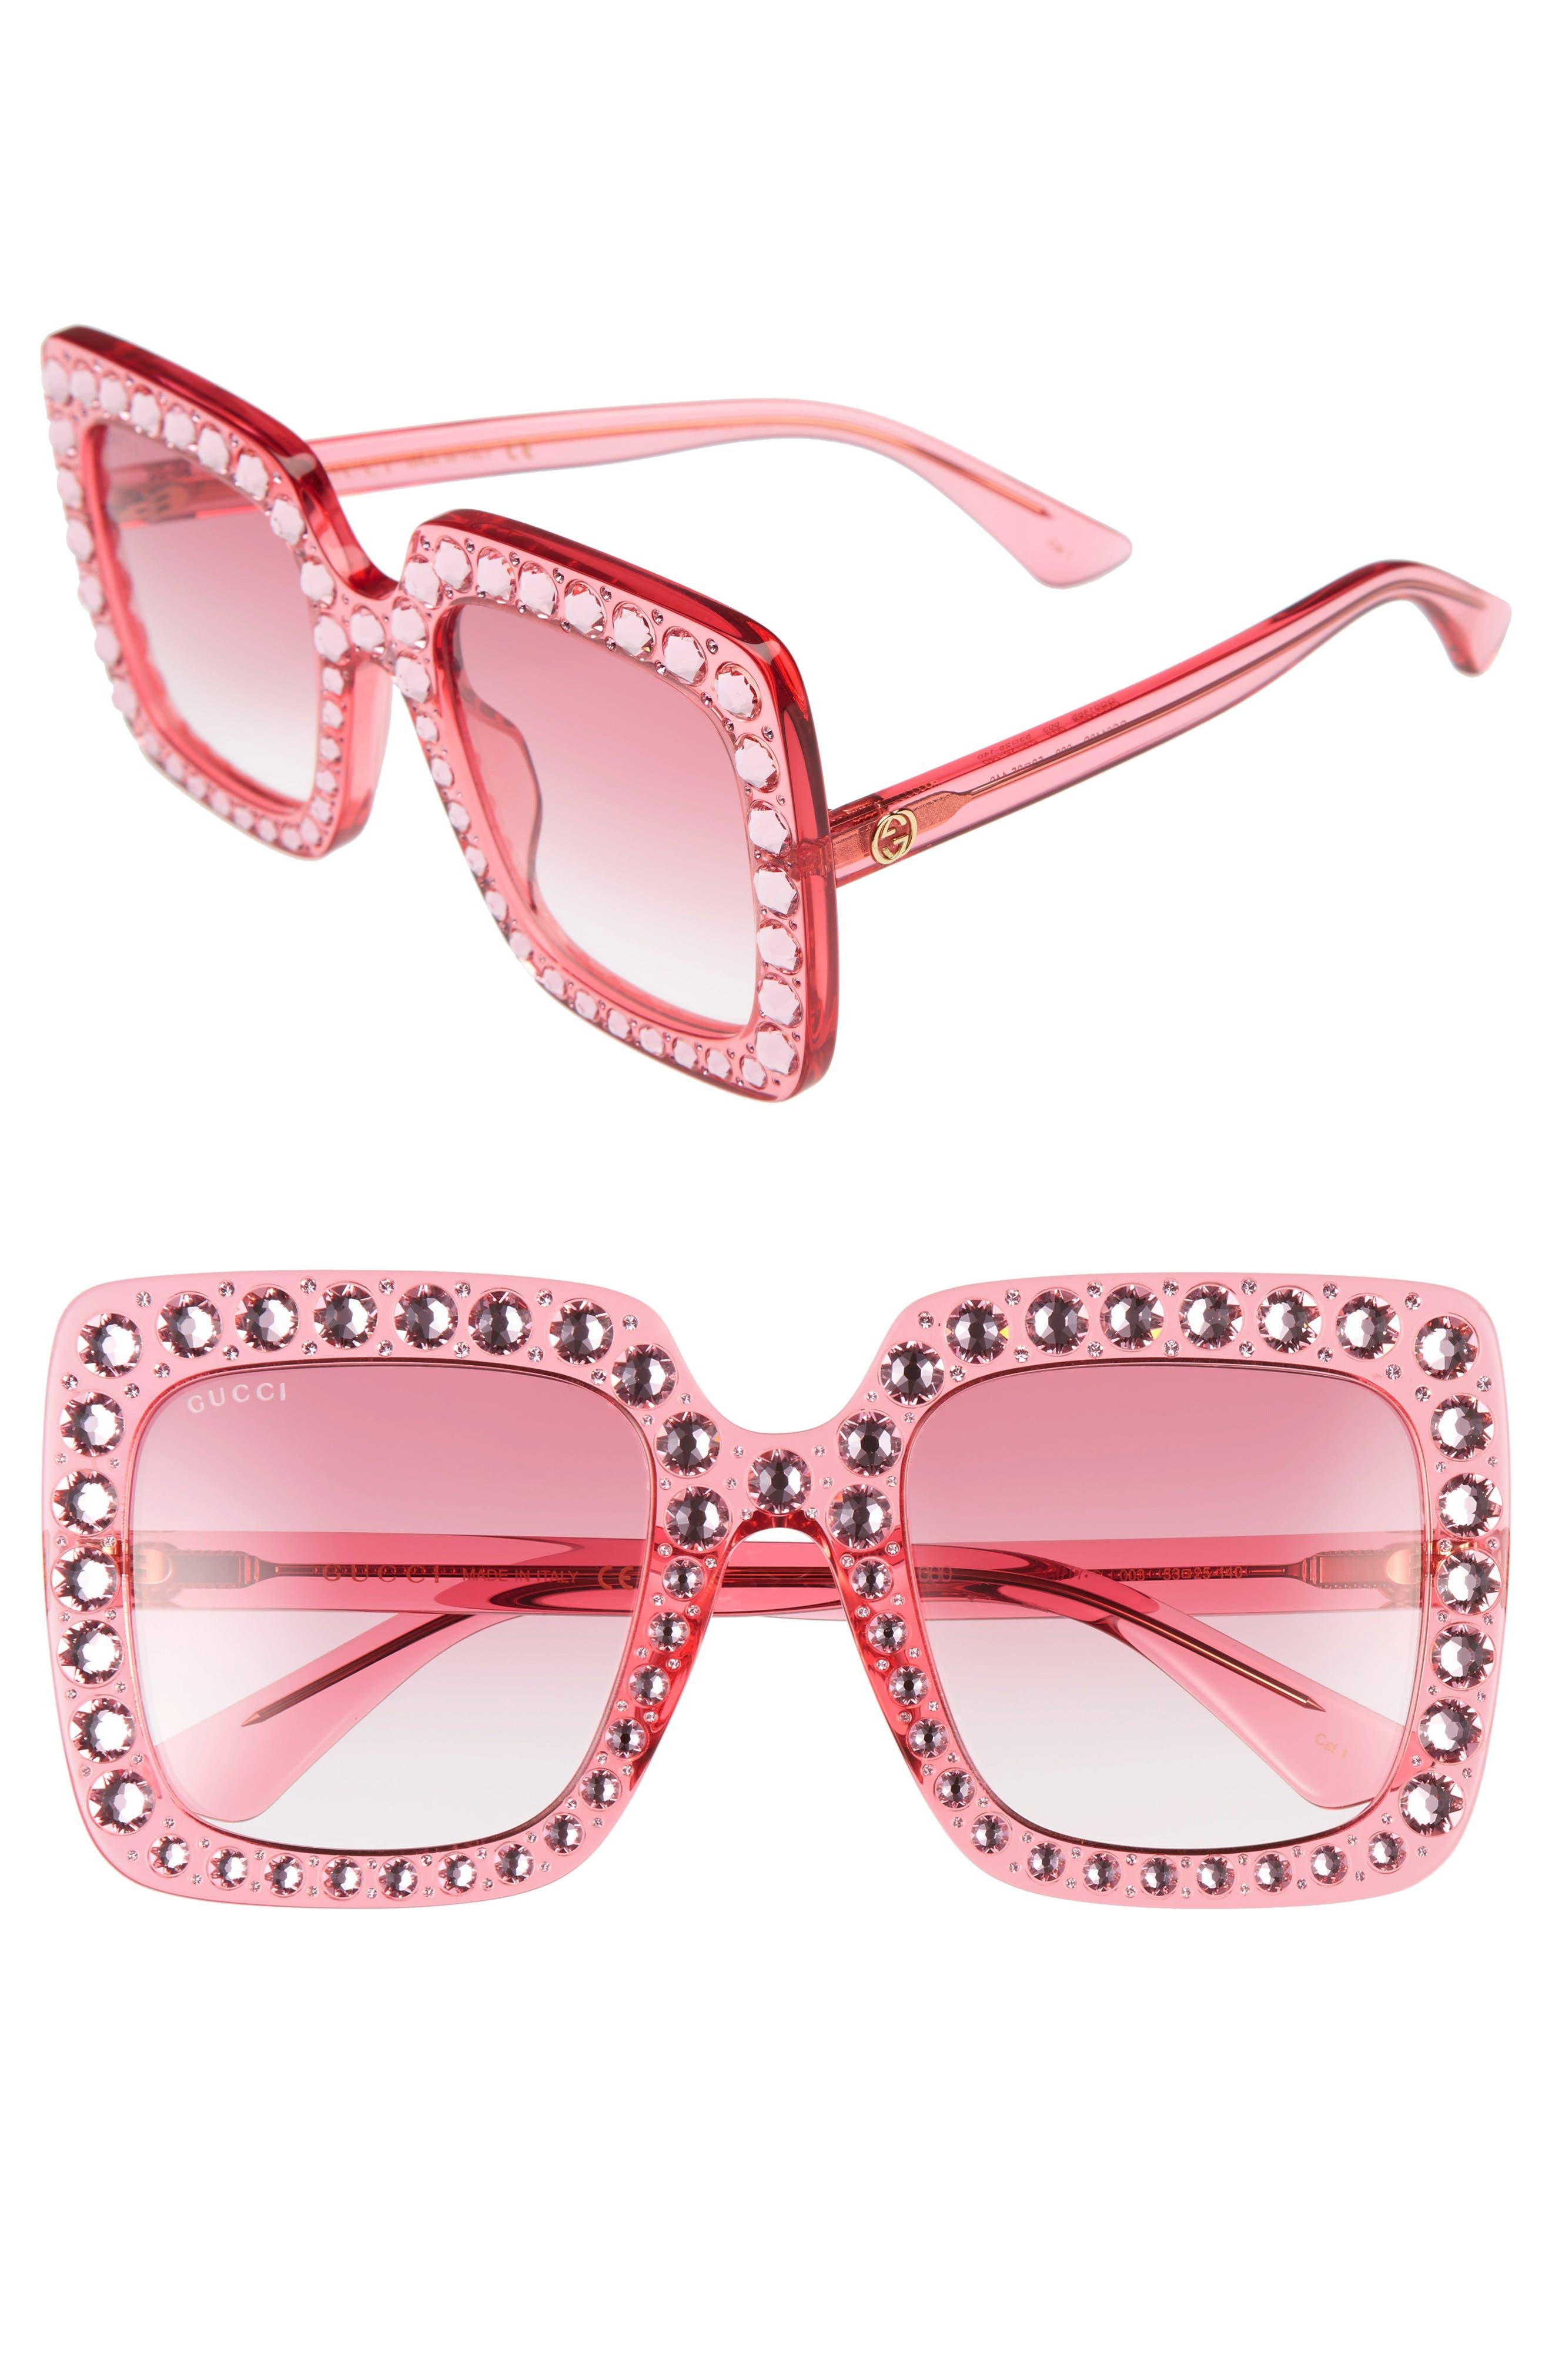 Alternate Image 1 Selected - Gucci 53mm Crystal Embellished Square Sunglasses